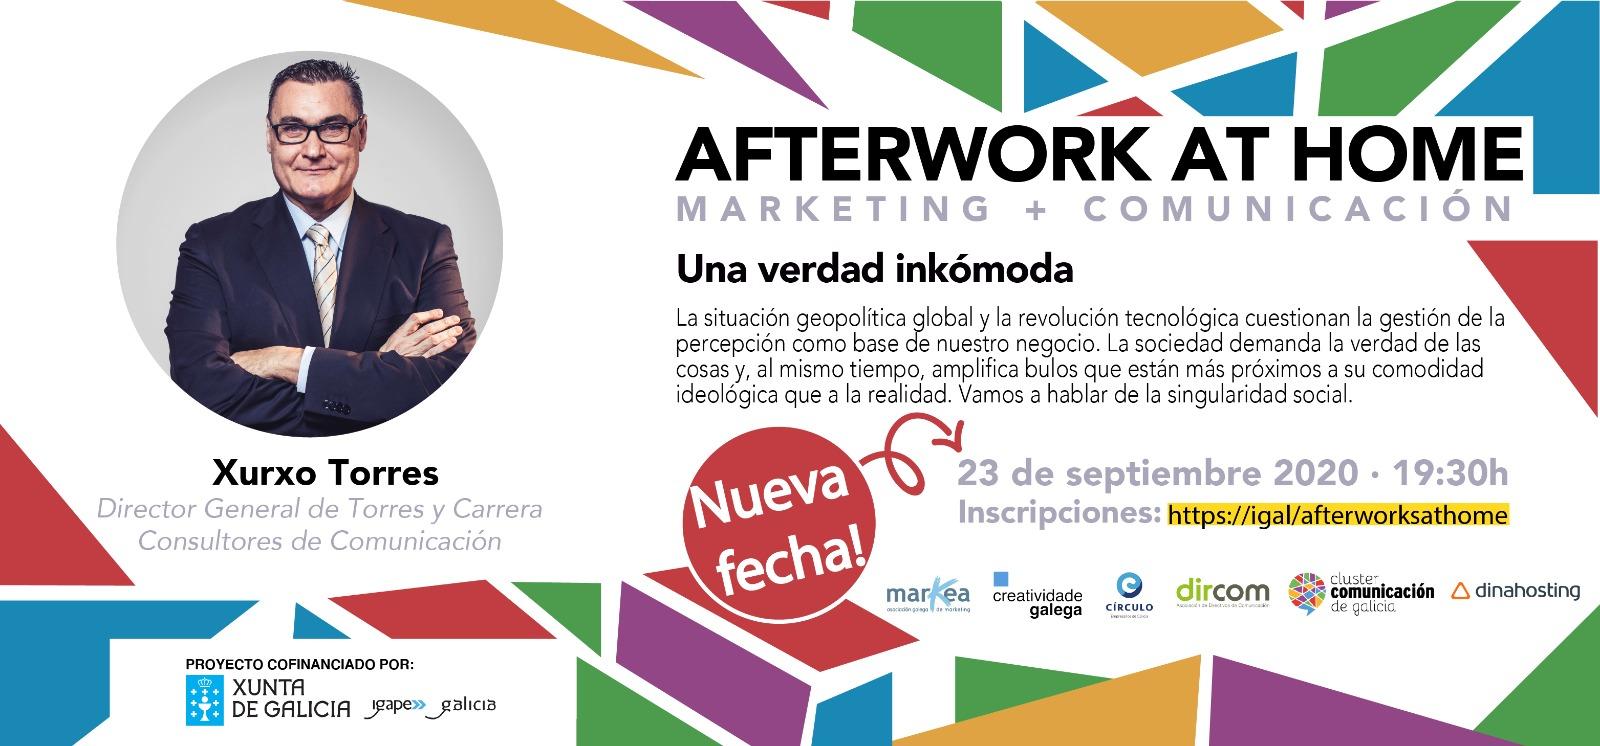 Afterwork Xurxo Torres